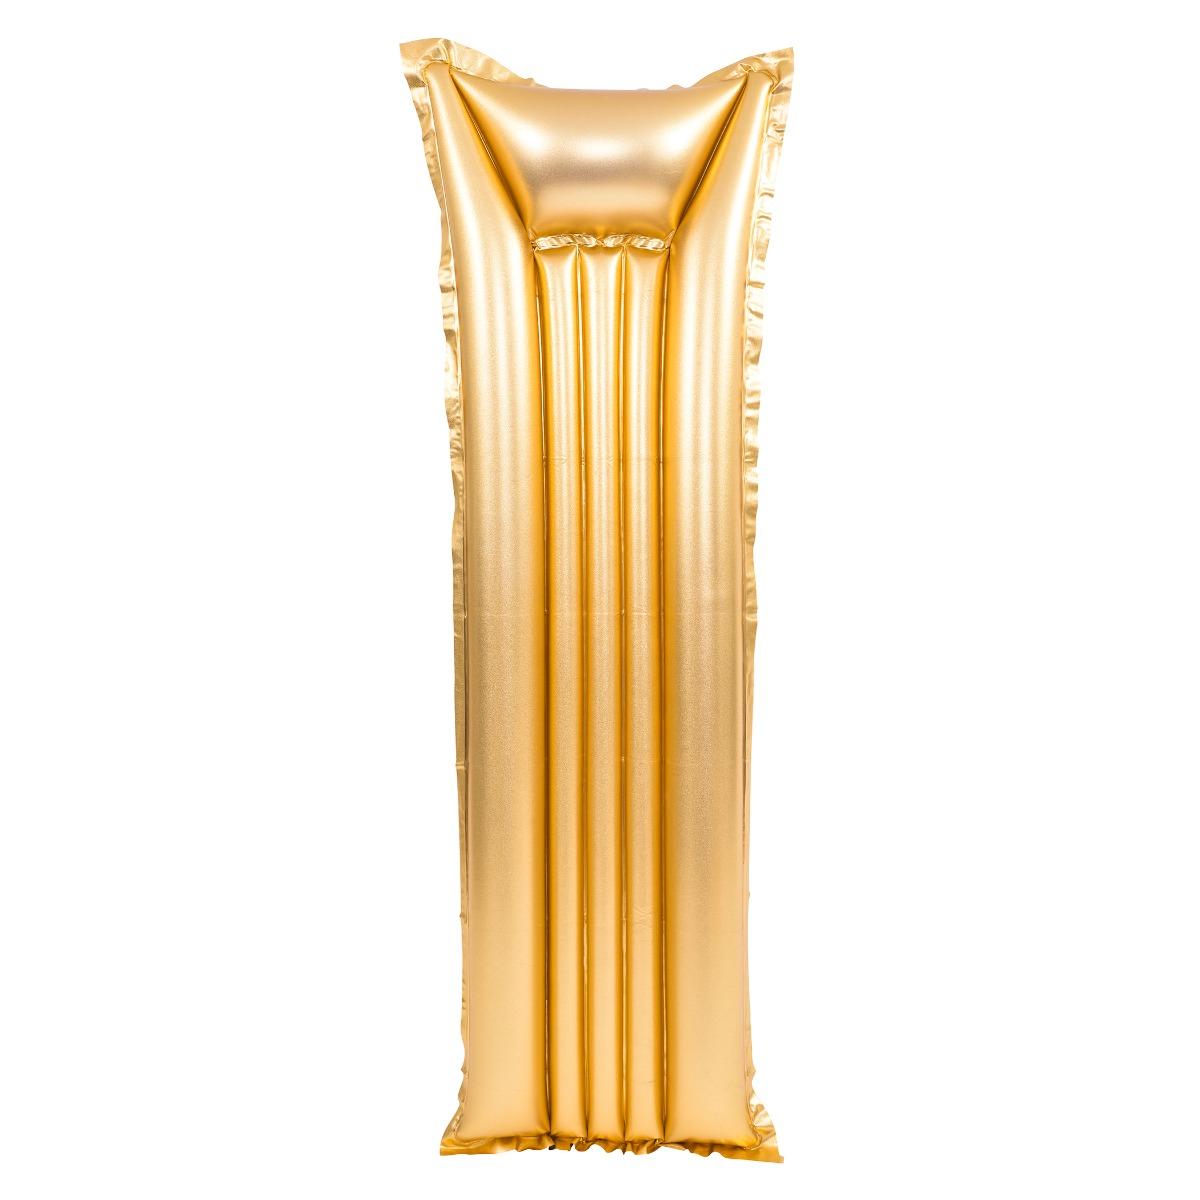 Saltea gonflabila Jilong, Golden, 183 x 69 cm